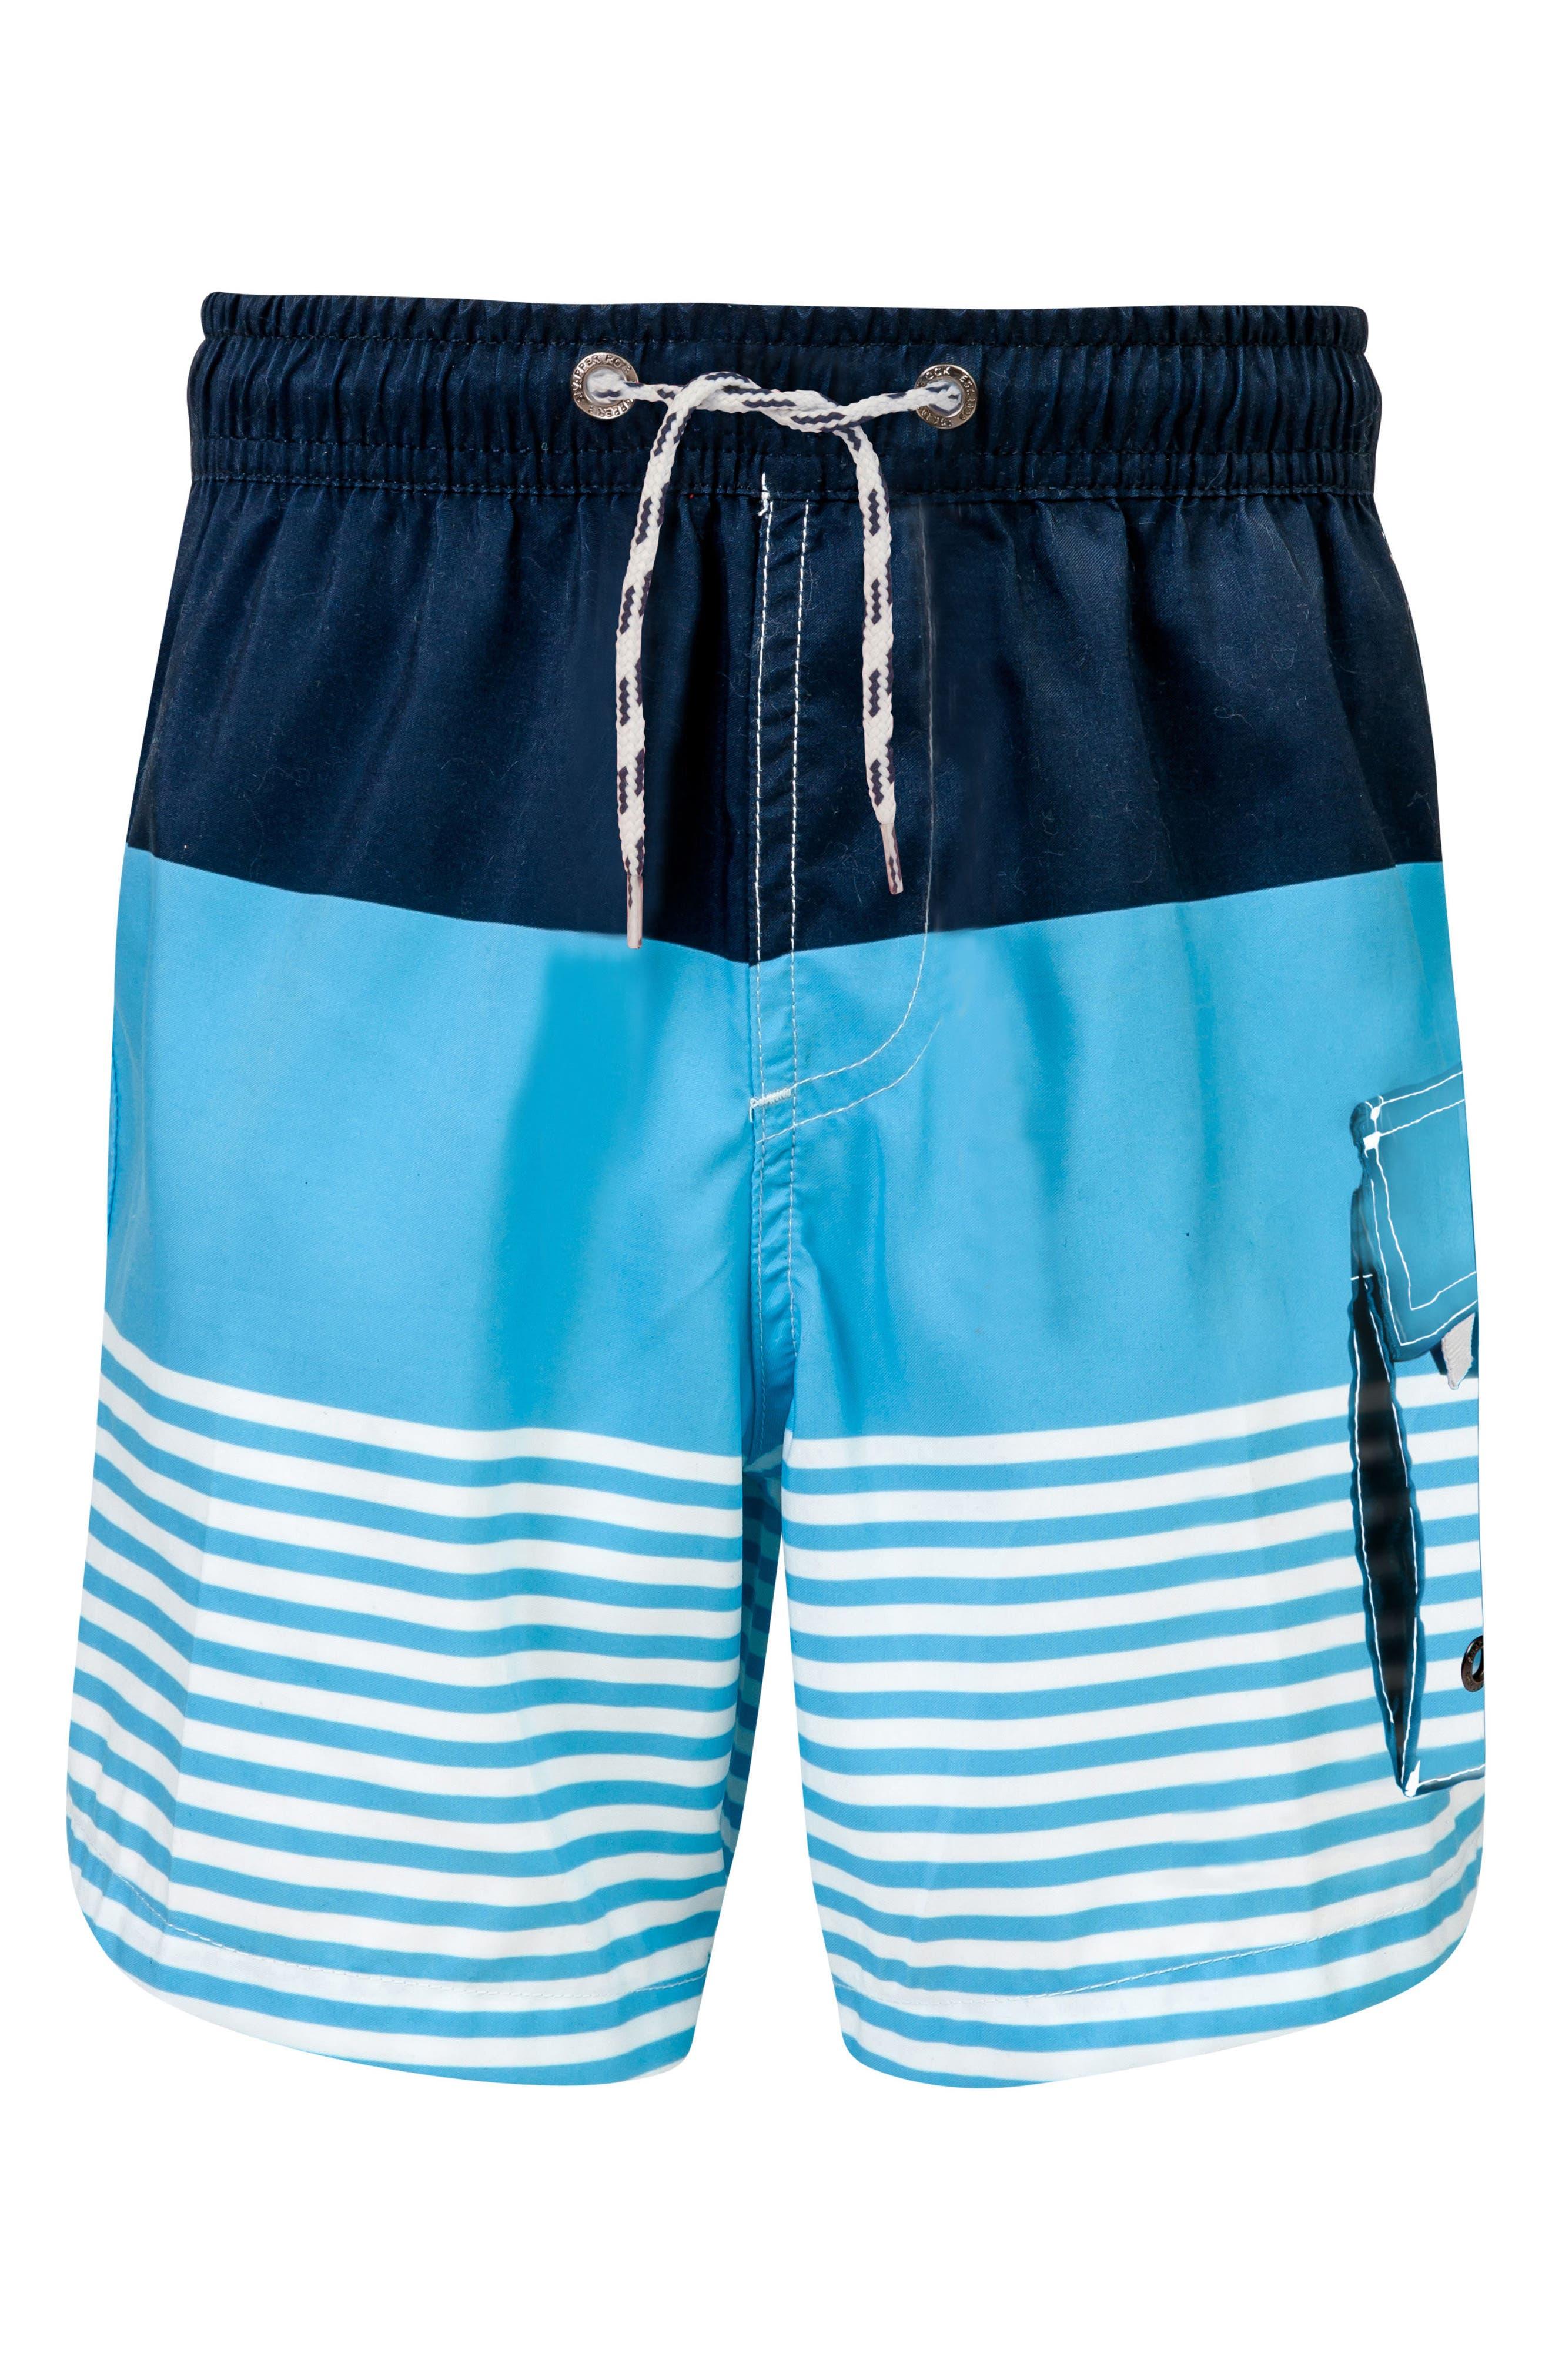 Stripe Board Shorts,                             Main thumbnail 1, color,                             410